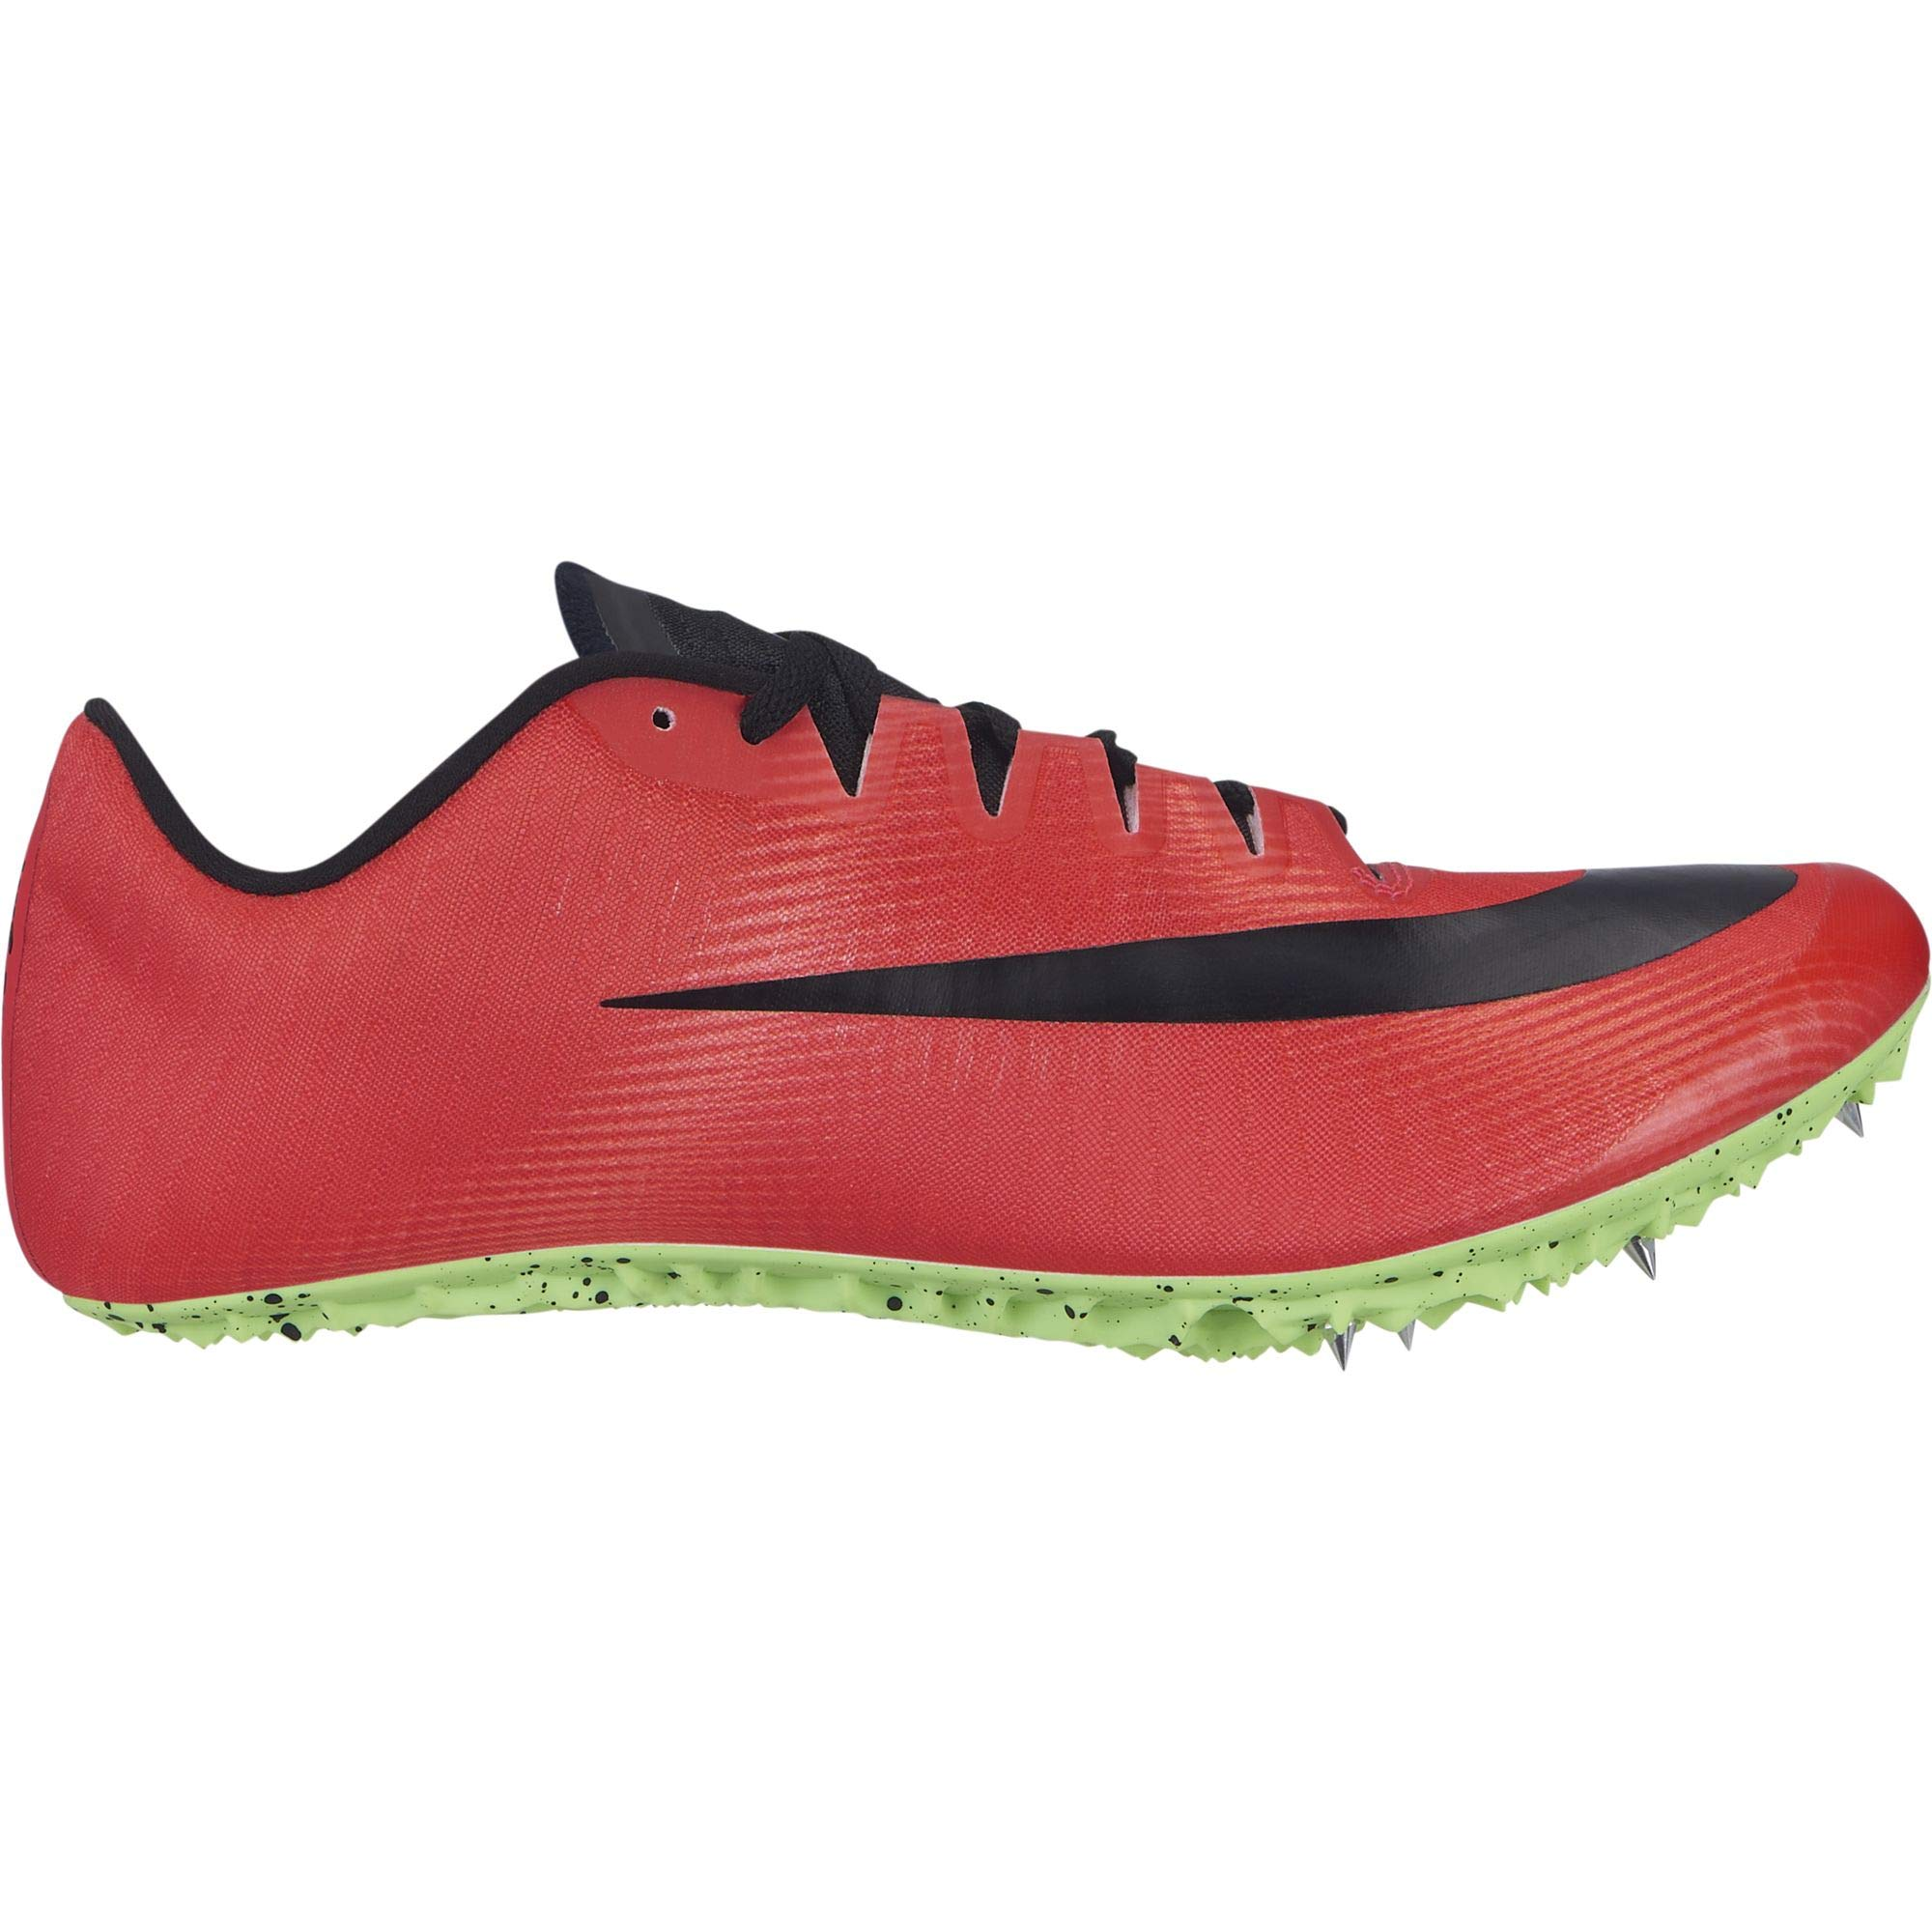 Nike Men's Zoom Ja Fly 3 Track Spike Red Orbit/Black/Flash Crimson/Lime Blast Size 9 M US